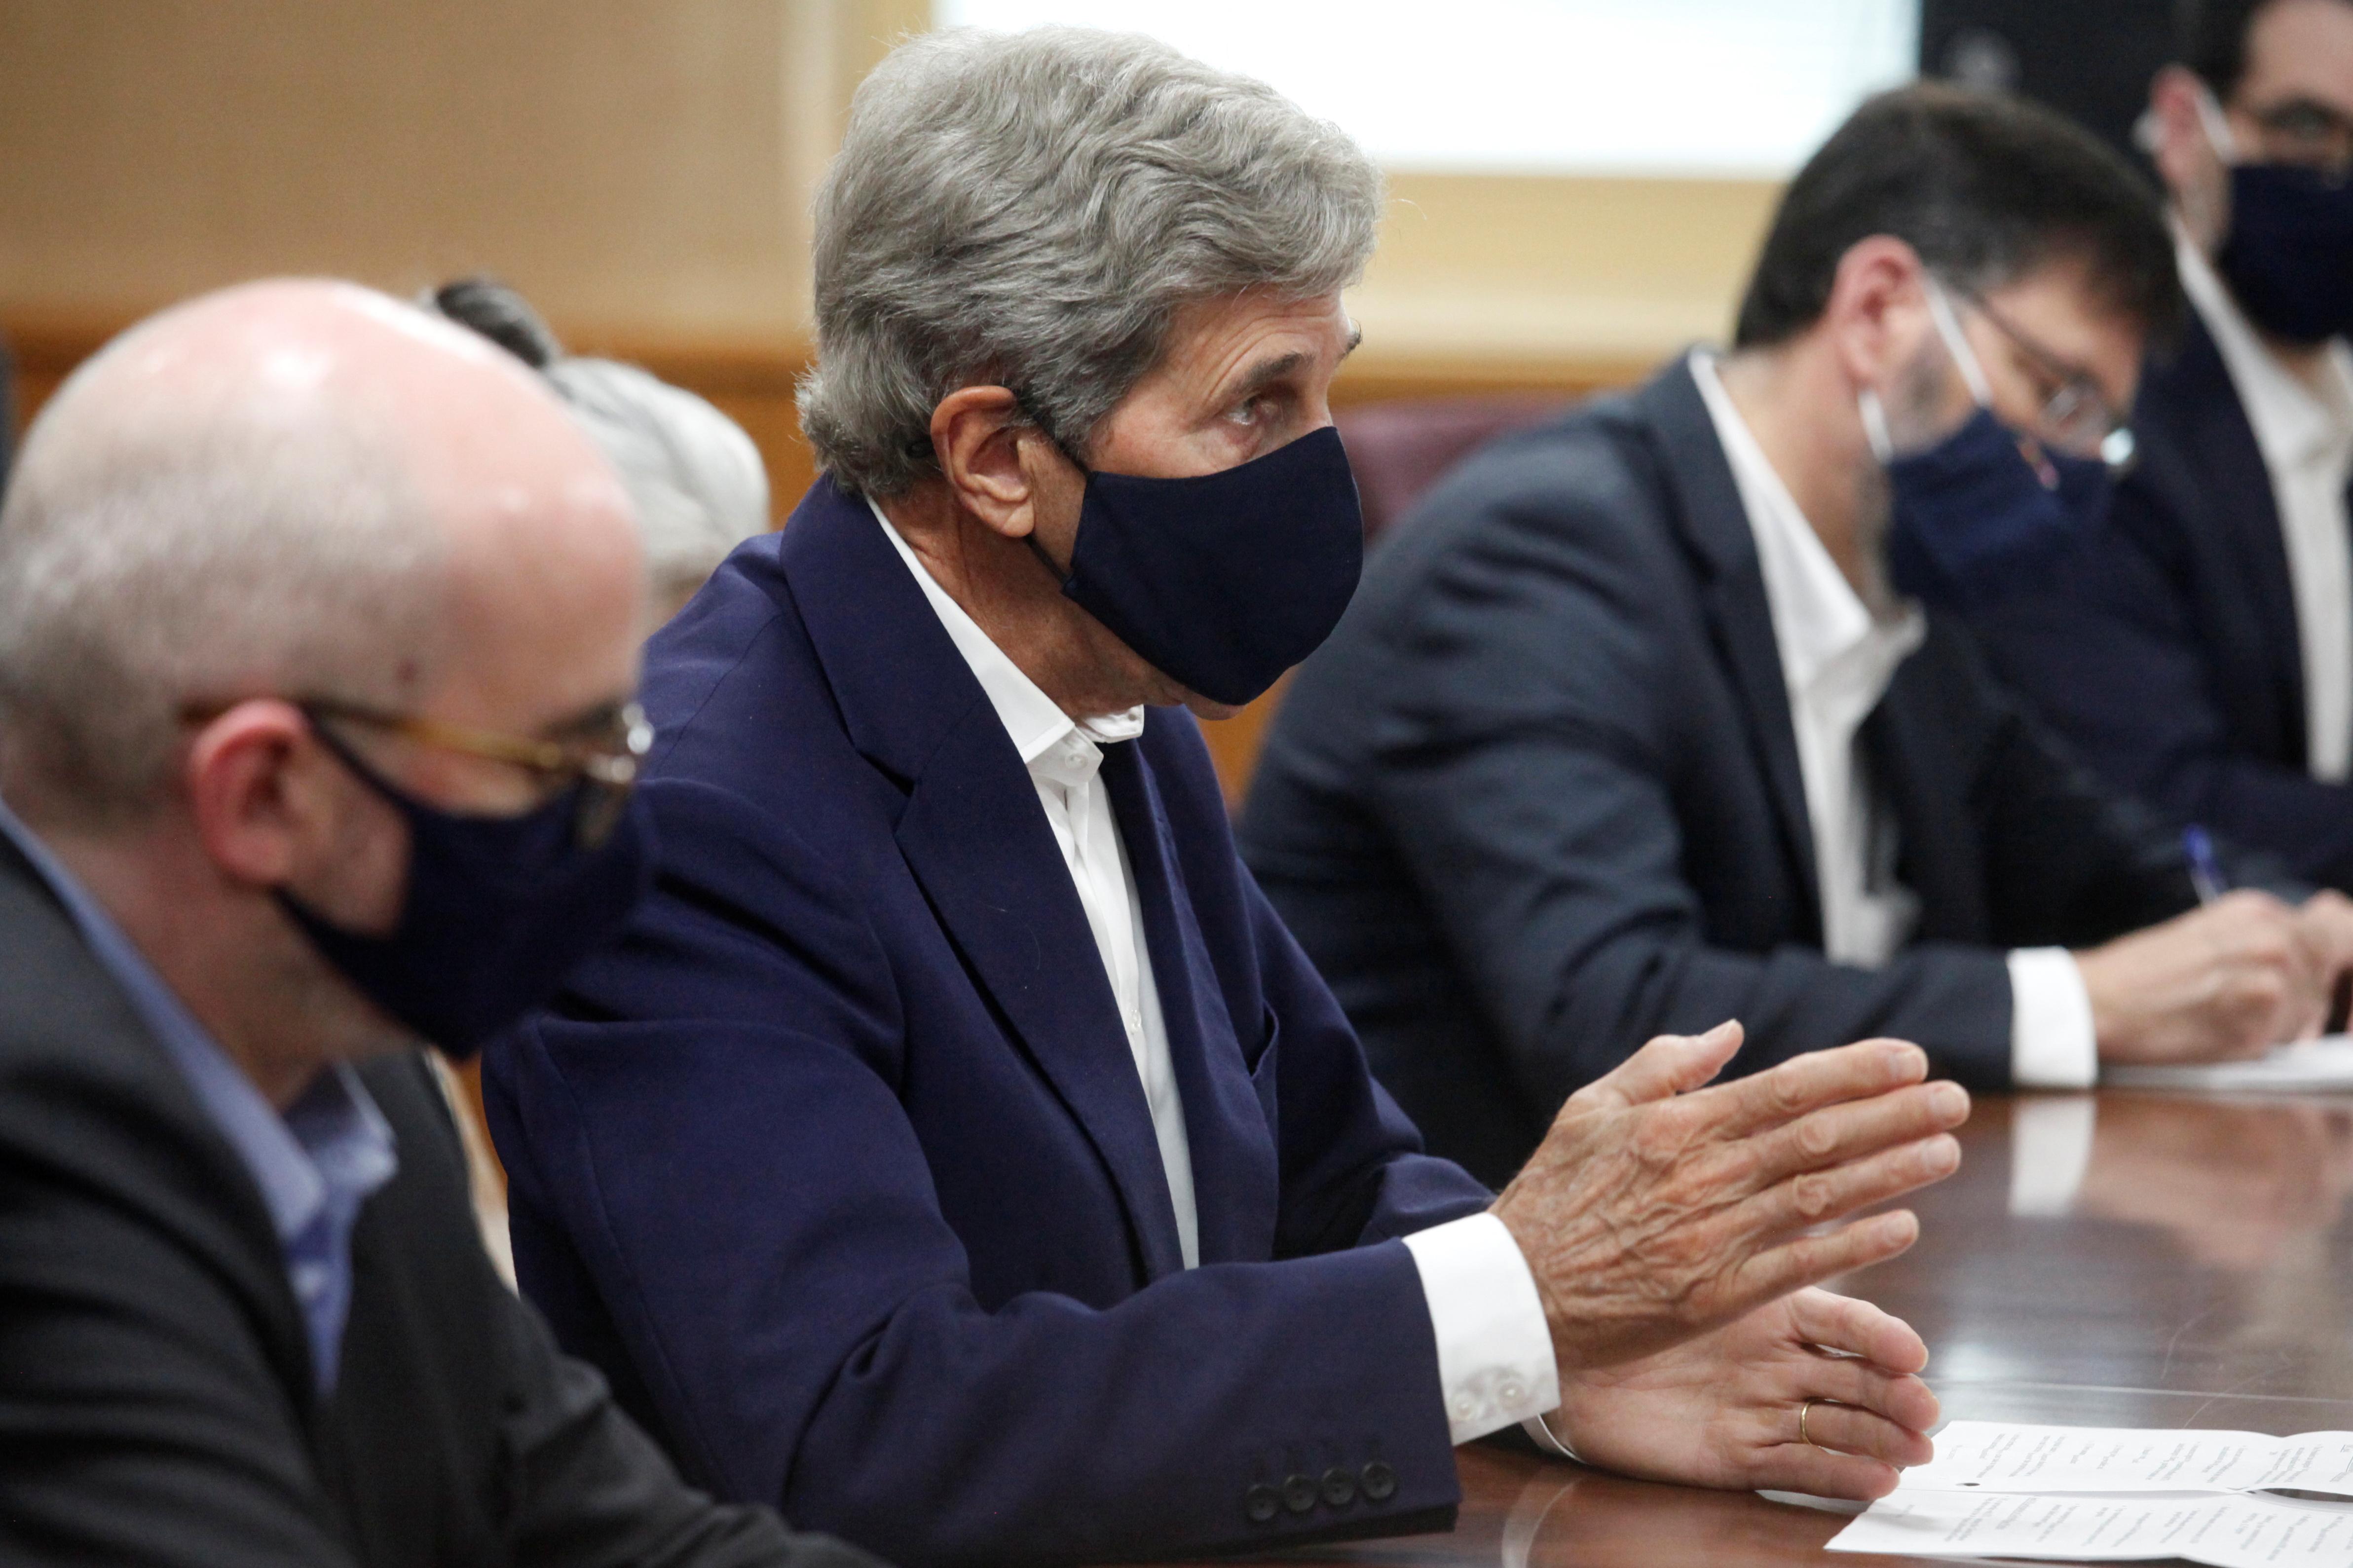 U.S. Special Presidential Envoy for Climate John Kerry talks with Japanese Minister of the Environment Shinjiro Koizumi in Tokyo, Japan, August, 31, 2021.  Koji Sasahara/Pool via REUTERS